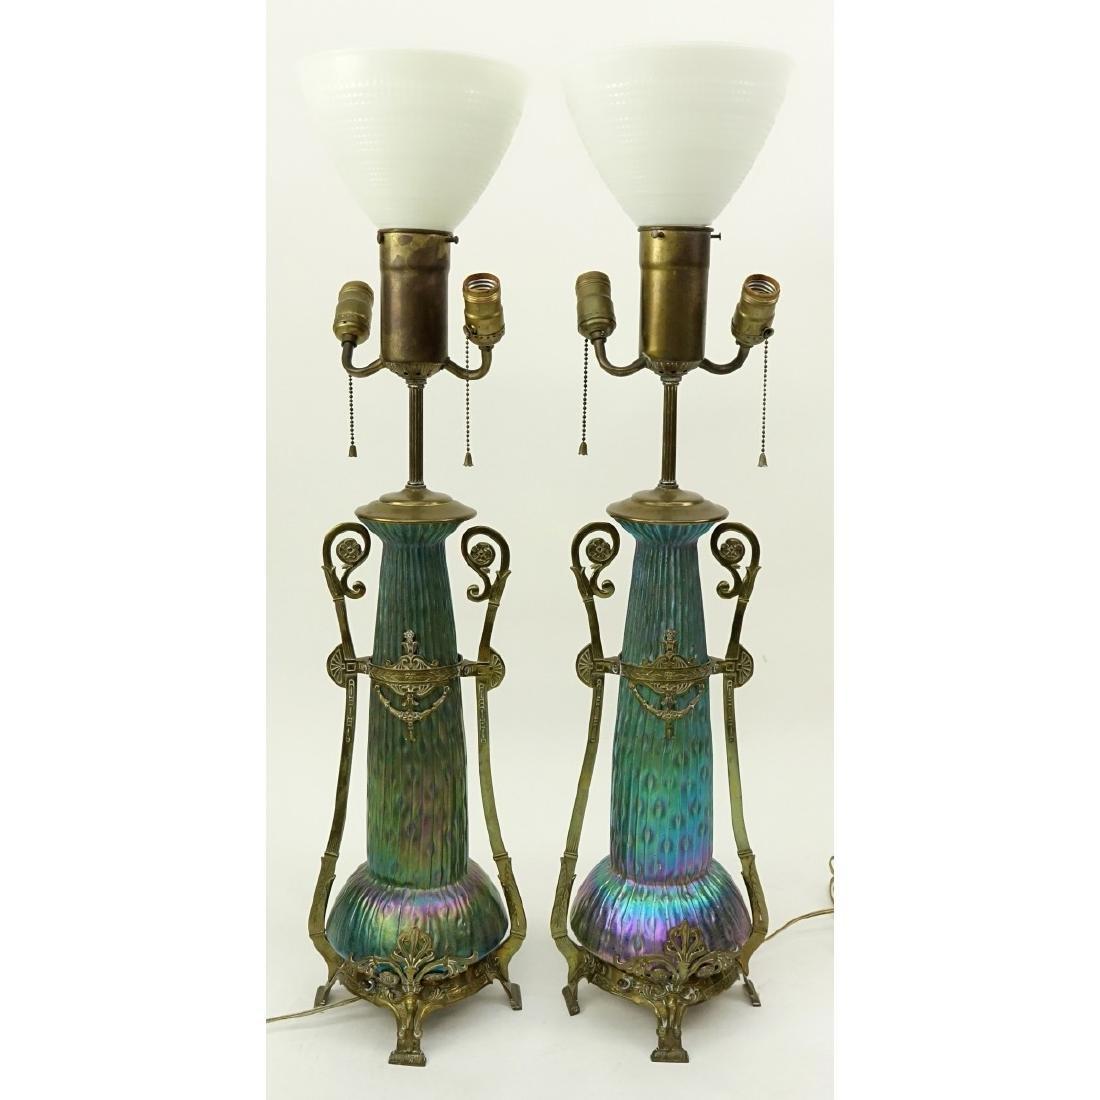 Pr Loetz Sea Urchin Art Nouveau Art Glass Lamps - 5